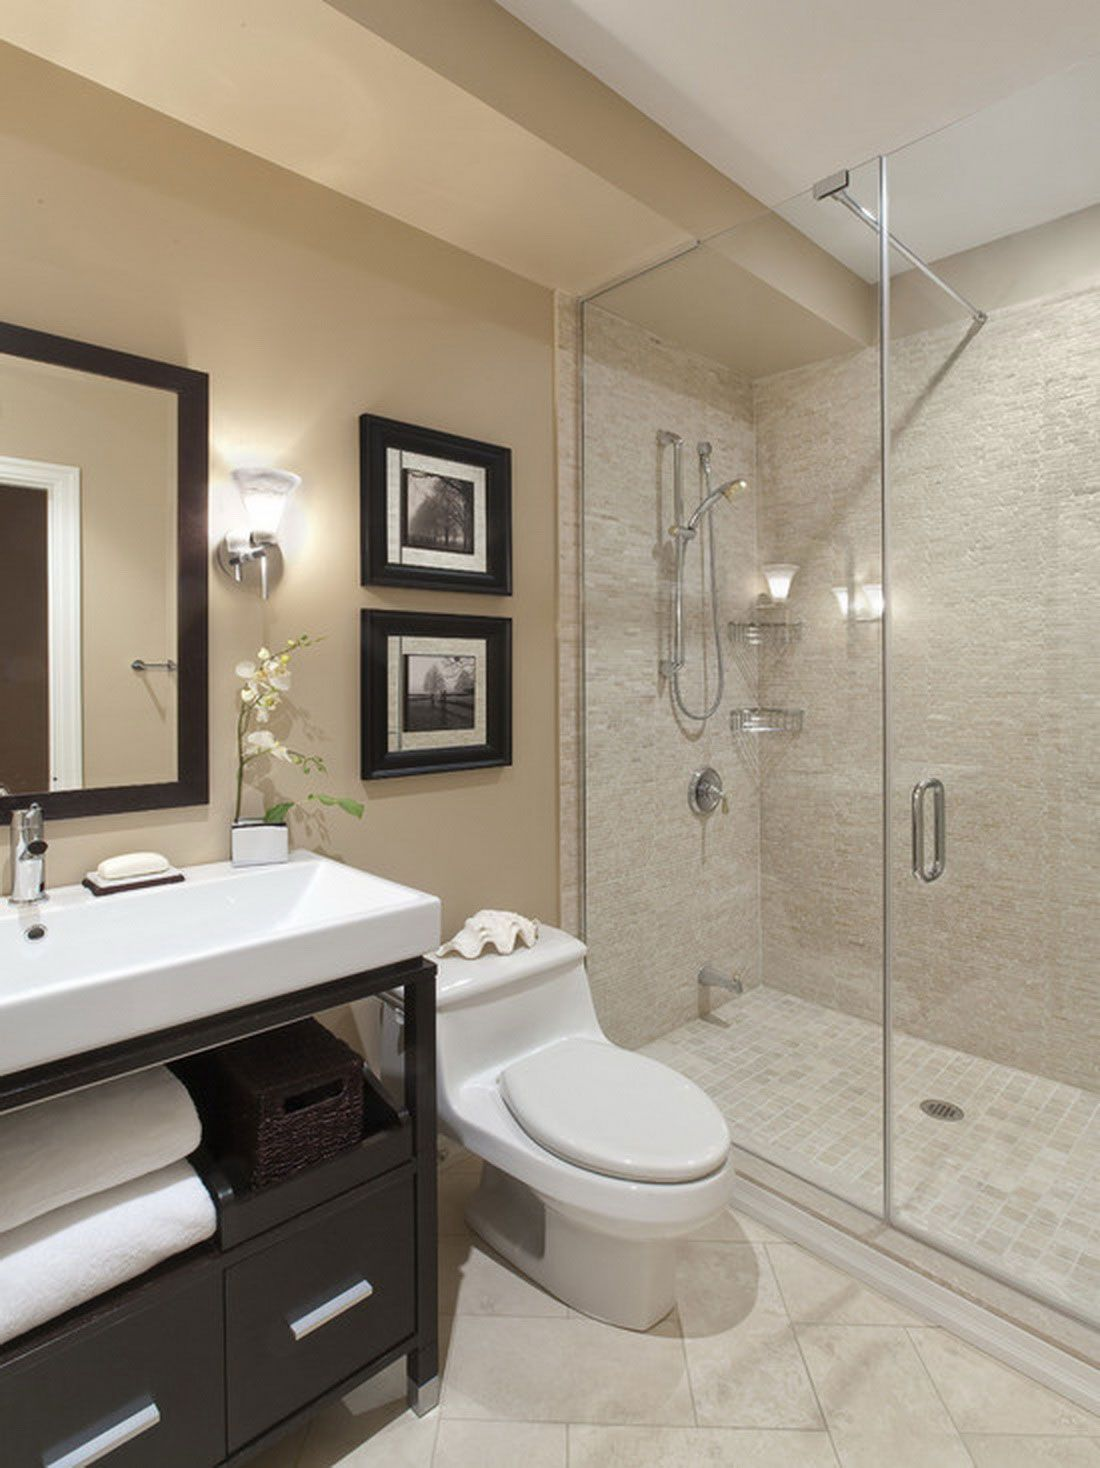 Contemporary bathroom design inspirations also extraordinary transitional designs for any home rh ar pinterest